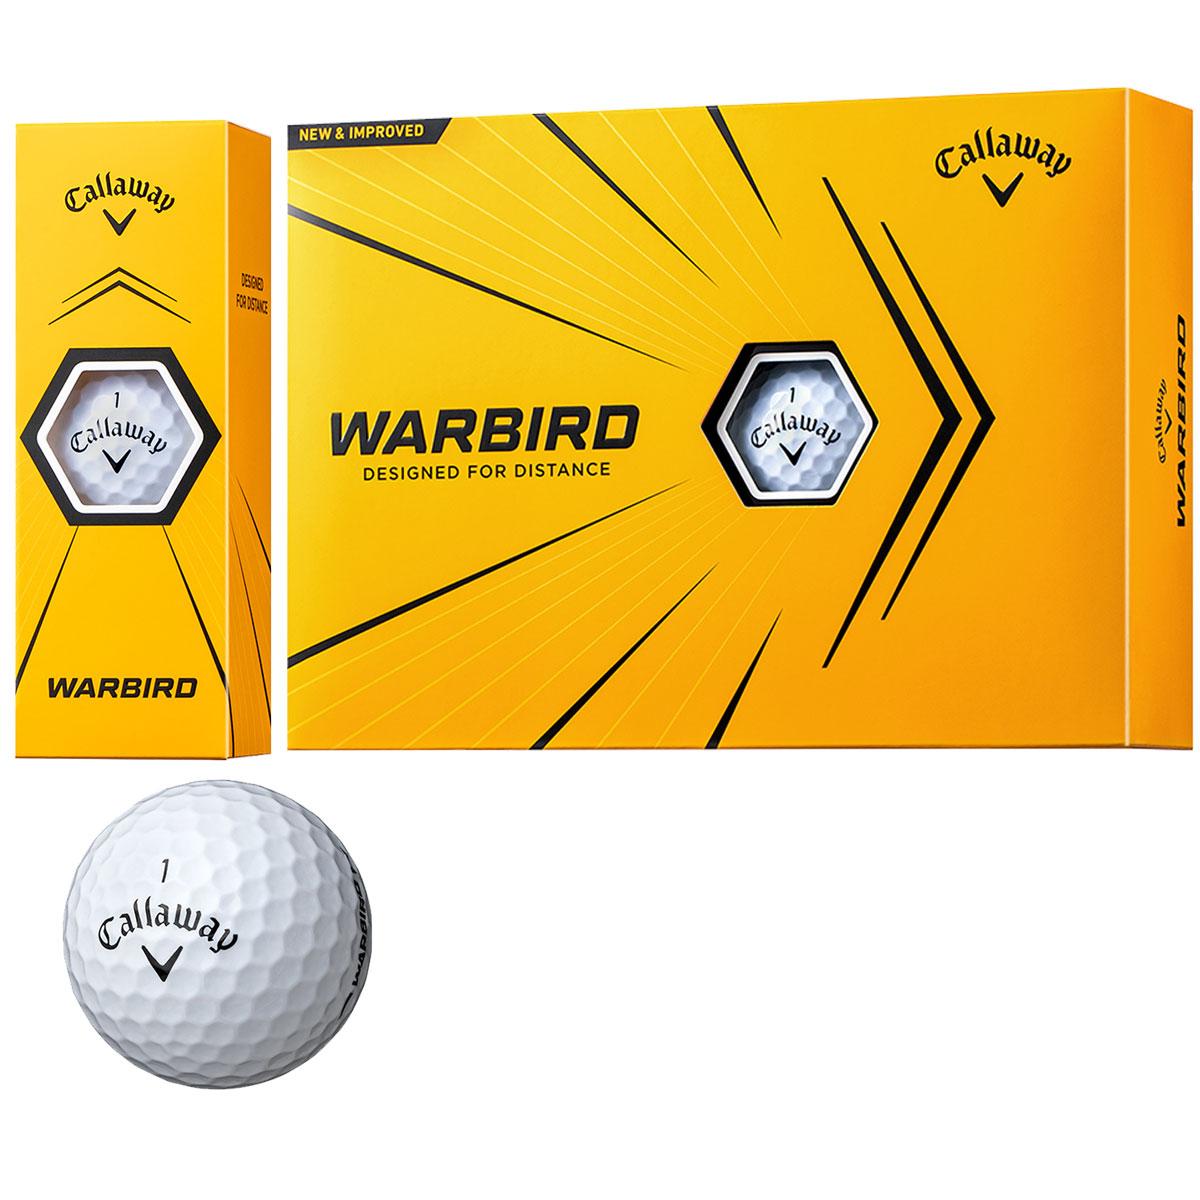 WARBIRD 21 ボール【2021年2月13日発売予定】